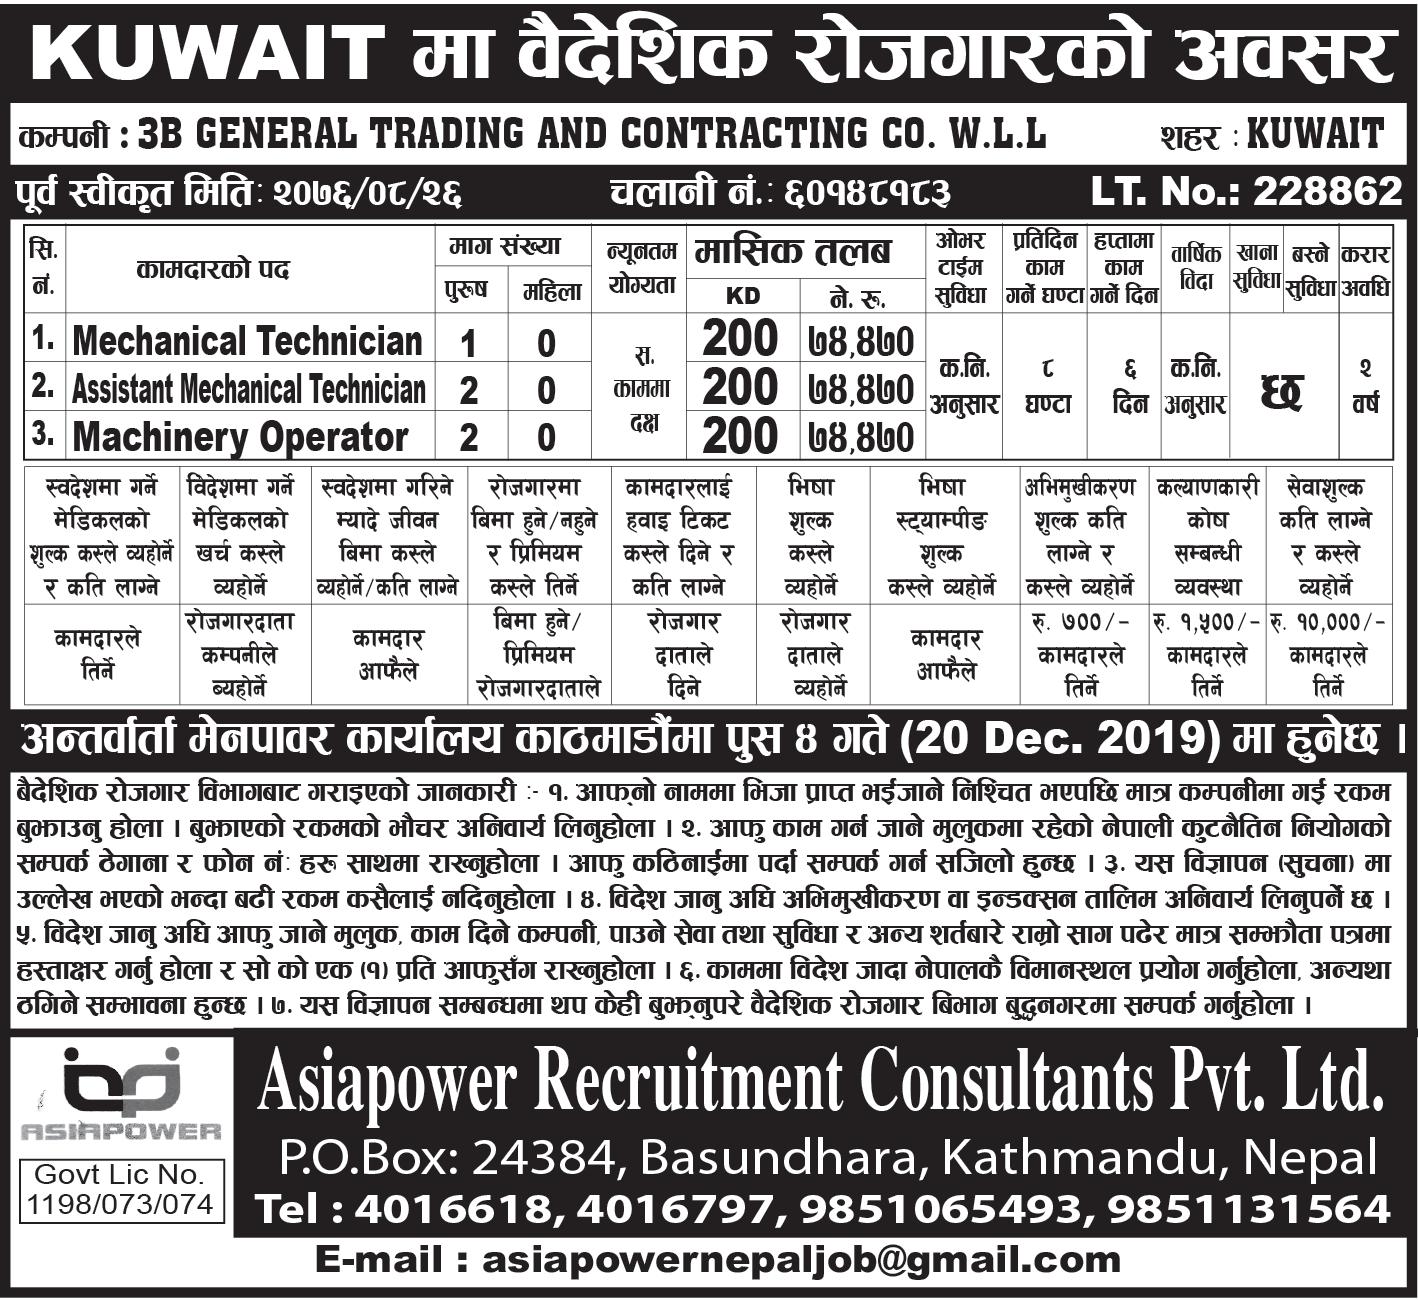 kuwait,mechanical technician,assistant mechanical technician,machinery operator